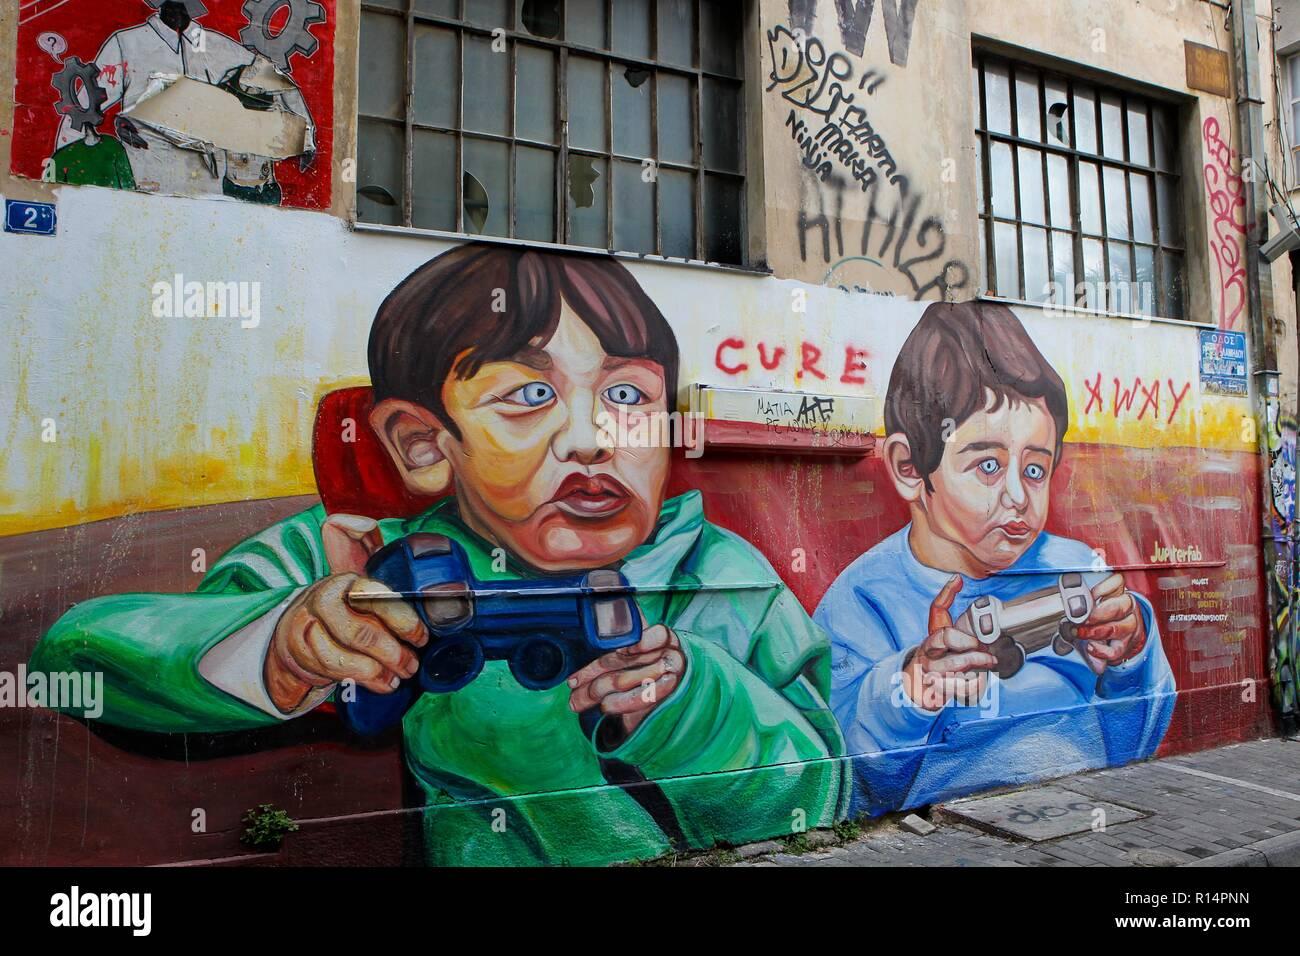 Greece, Athens, graffiti in Psiri district - Stock Image